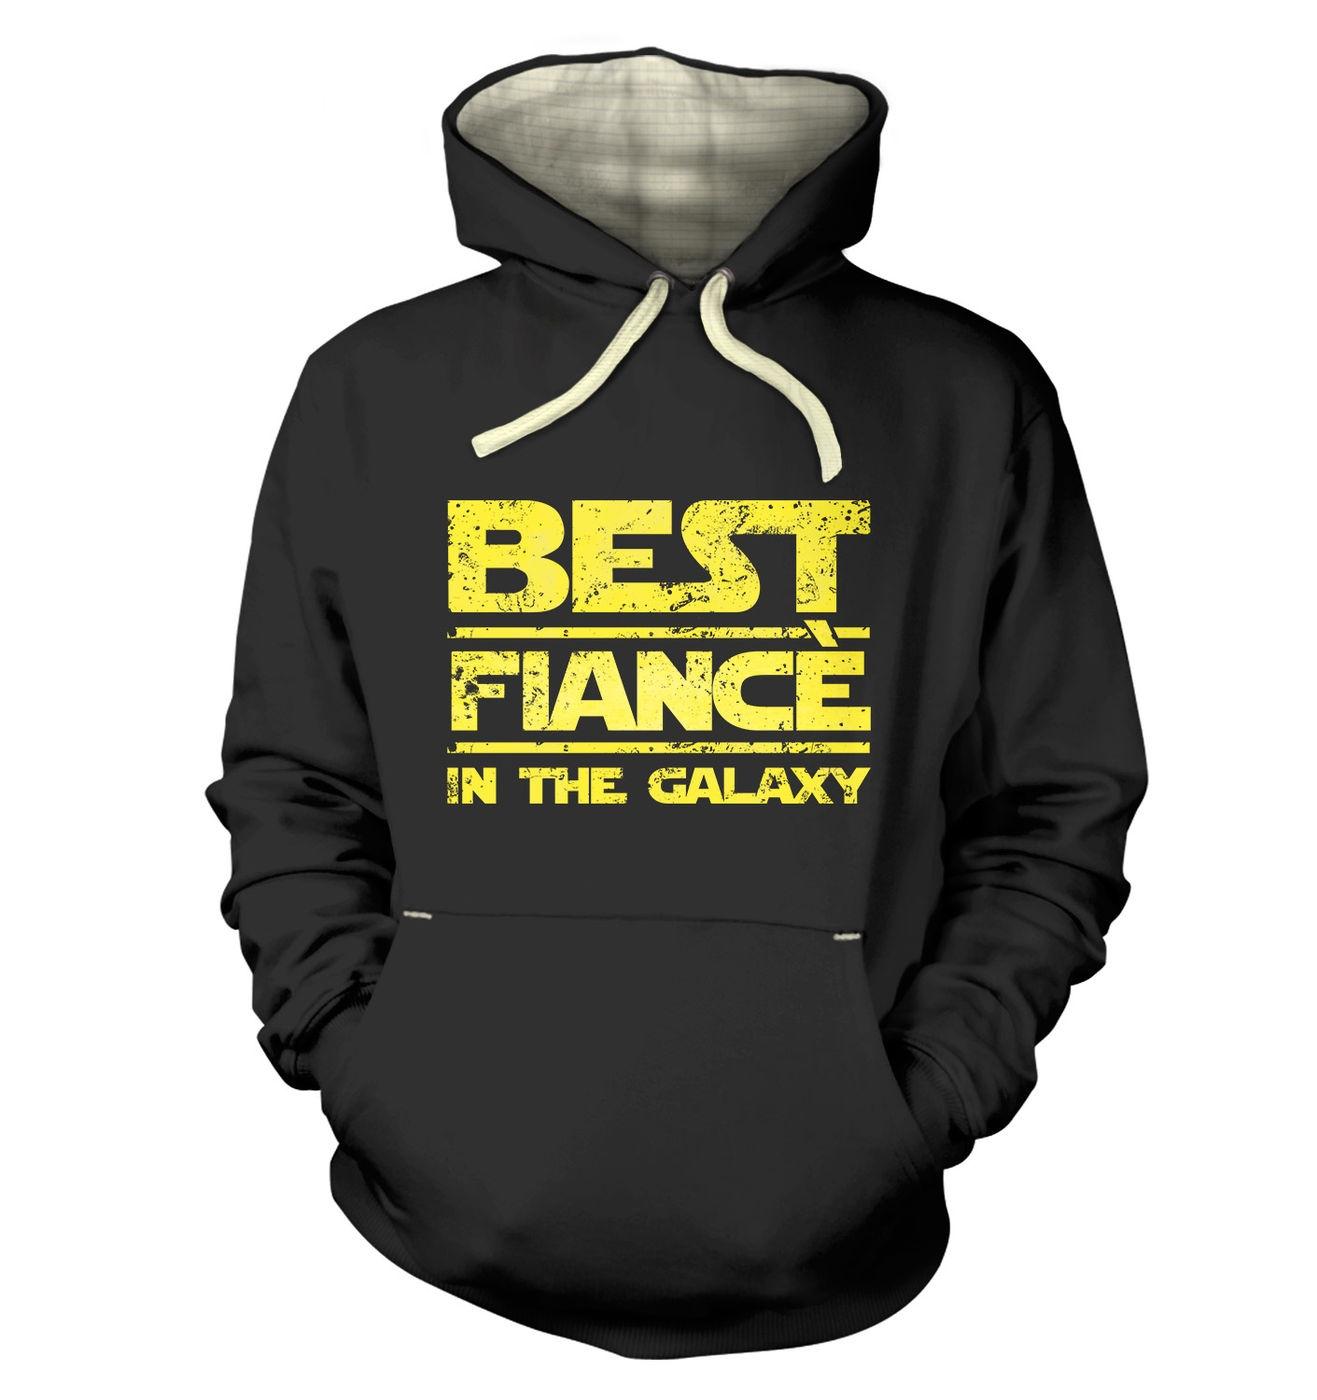 Best Fiancee In The Galaxy premium hoodie by Something Geeky